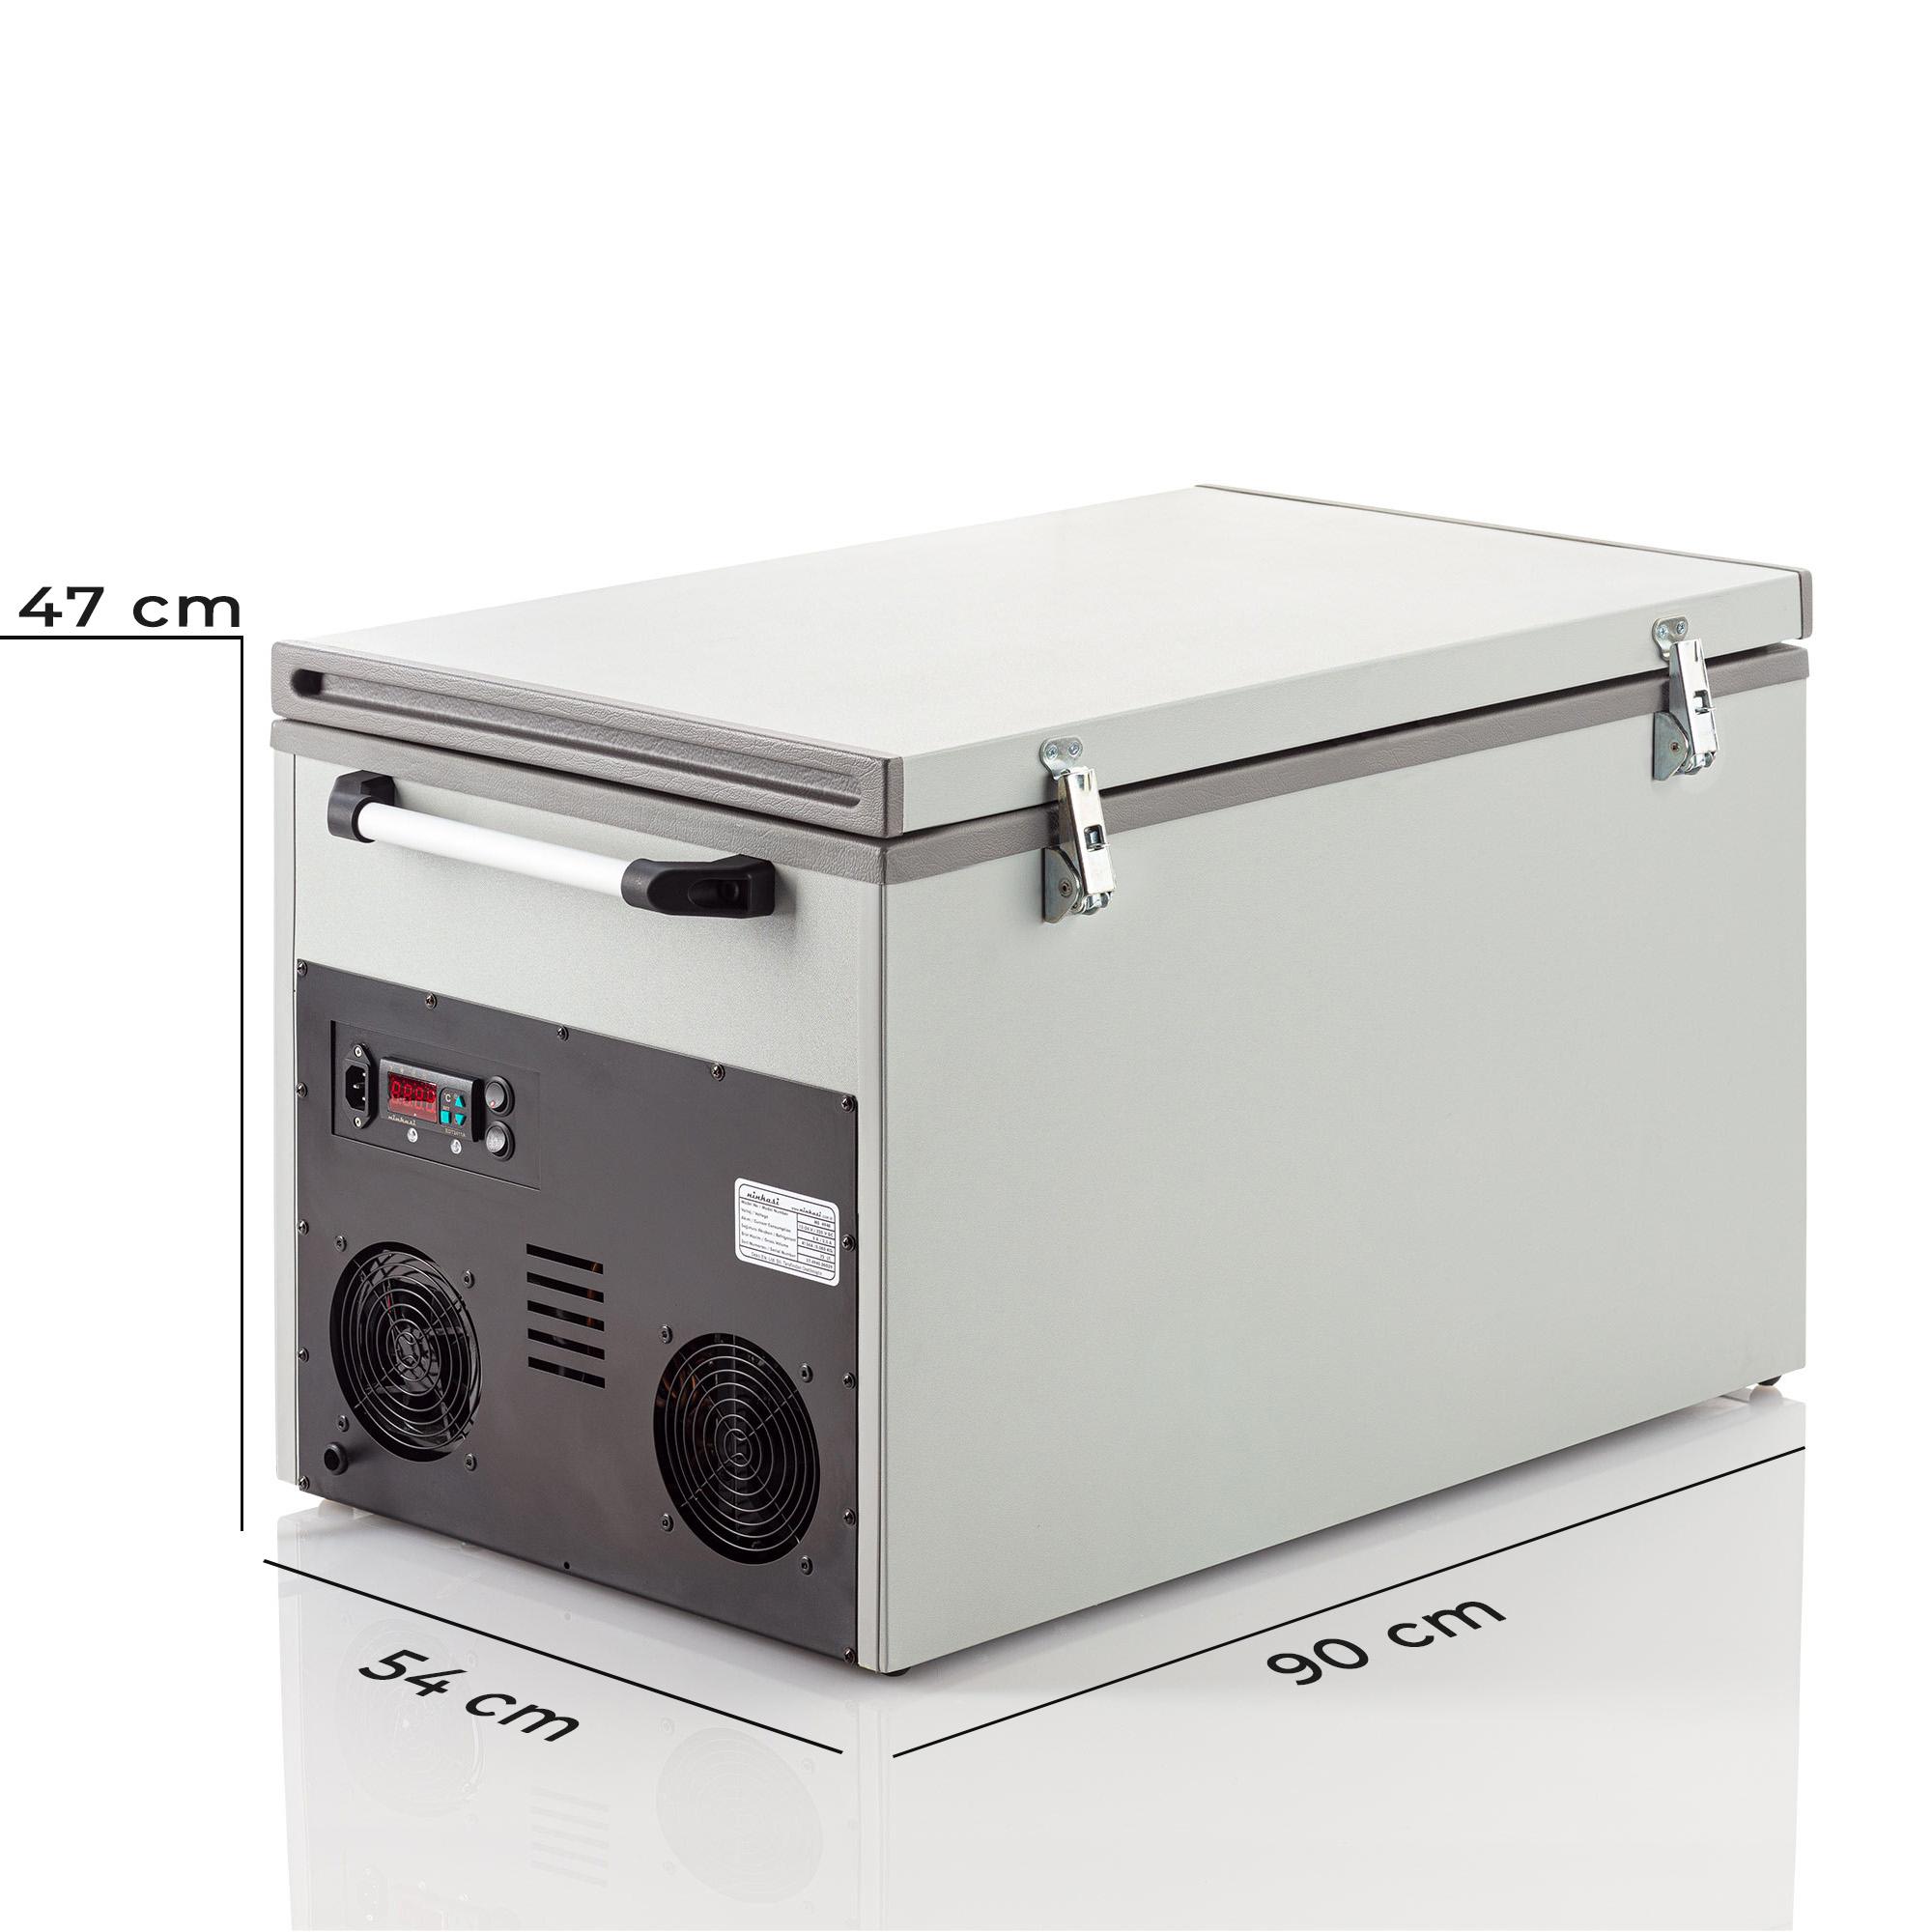 MPO 4940 / 72 LT Soğutucu Araç Buzdolabı